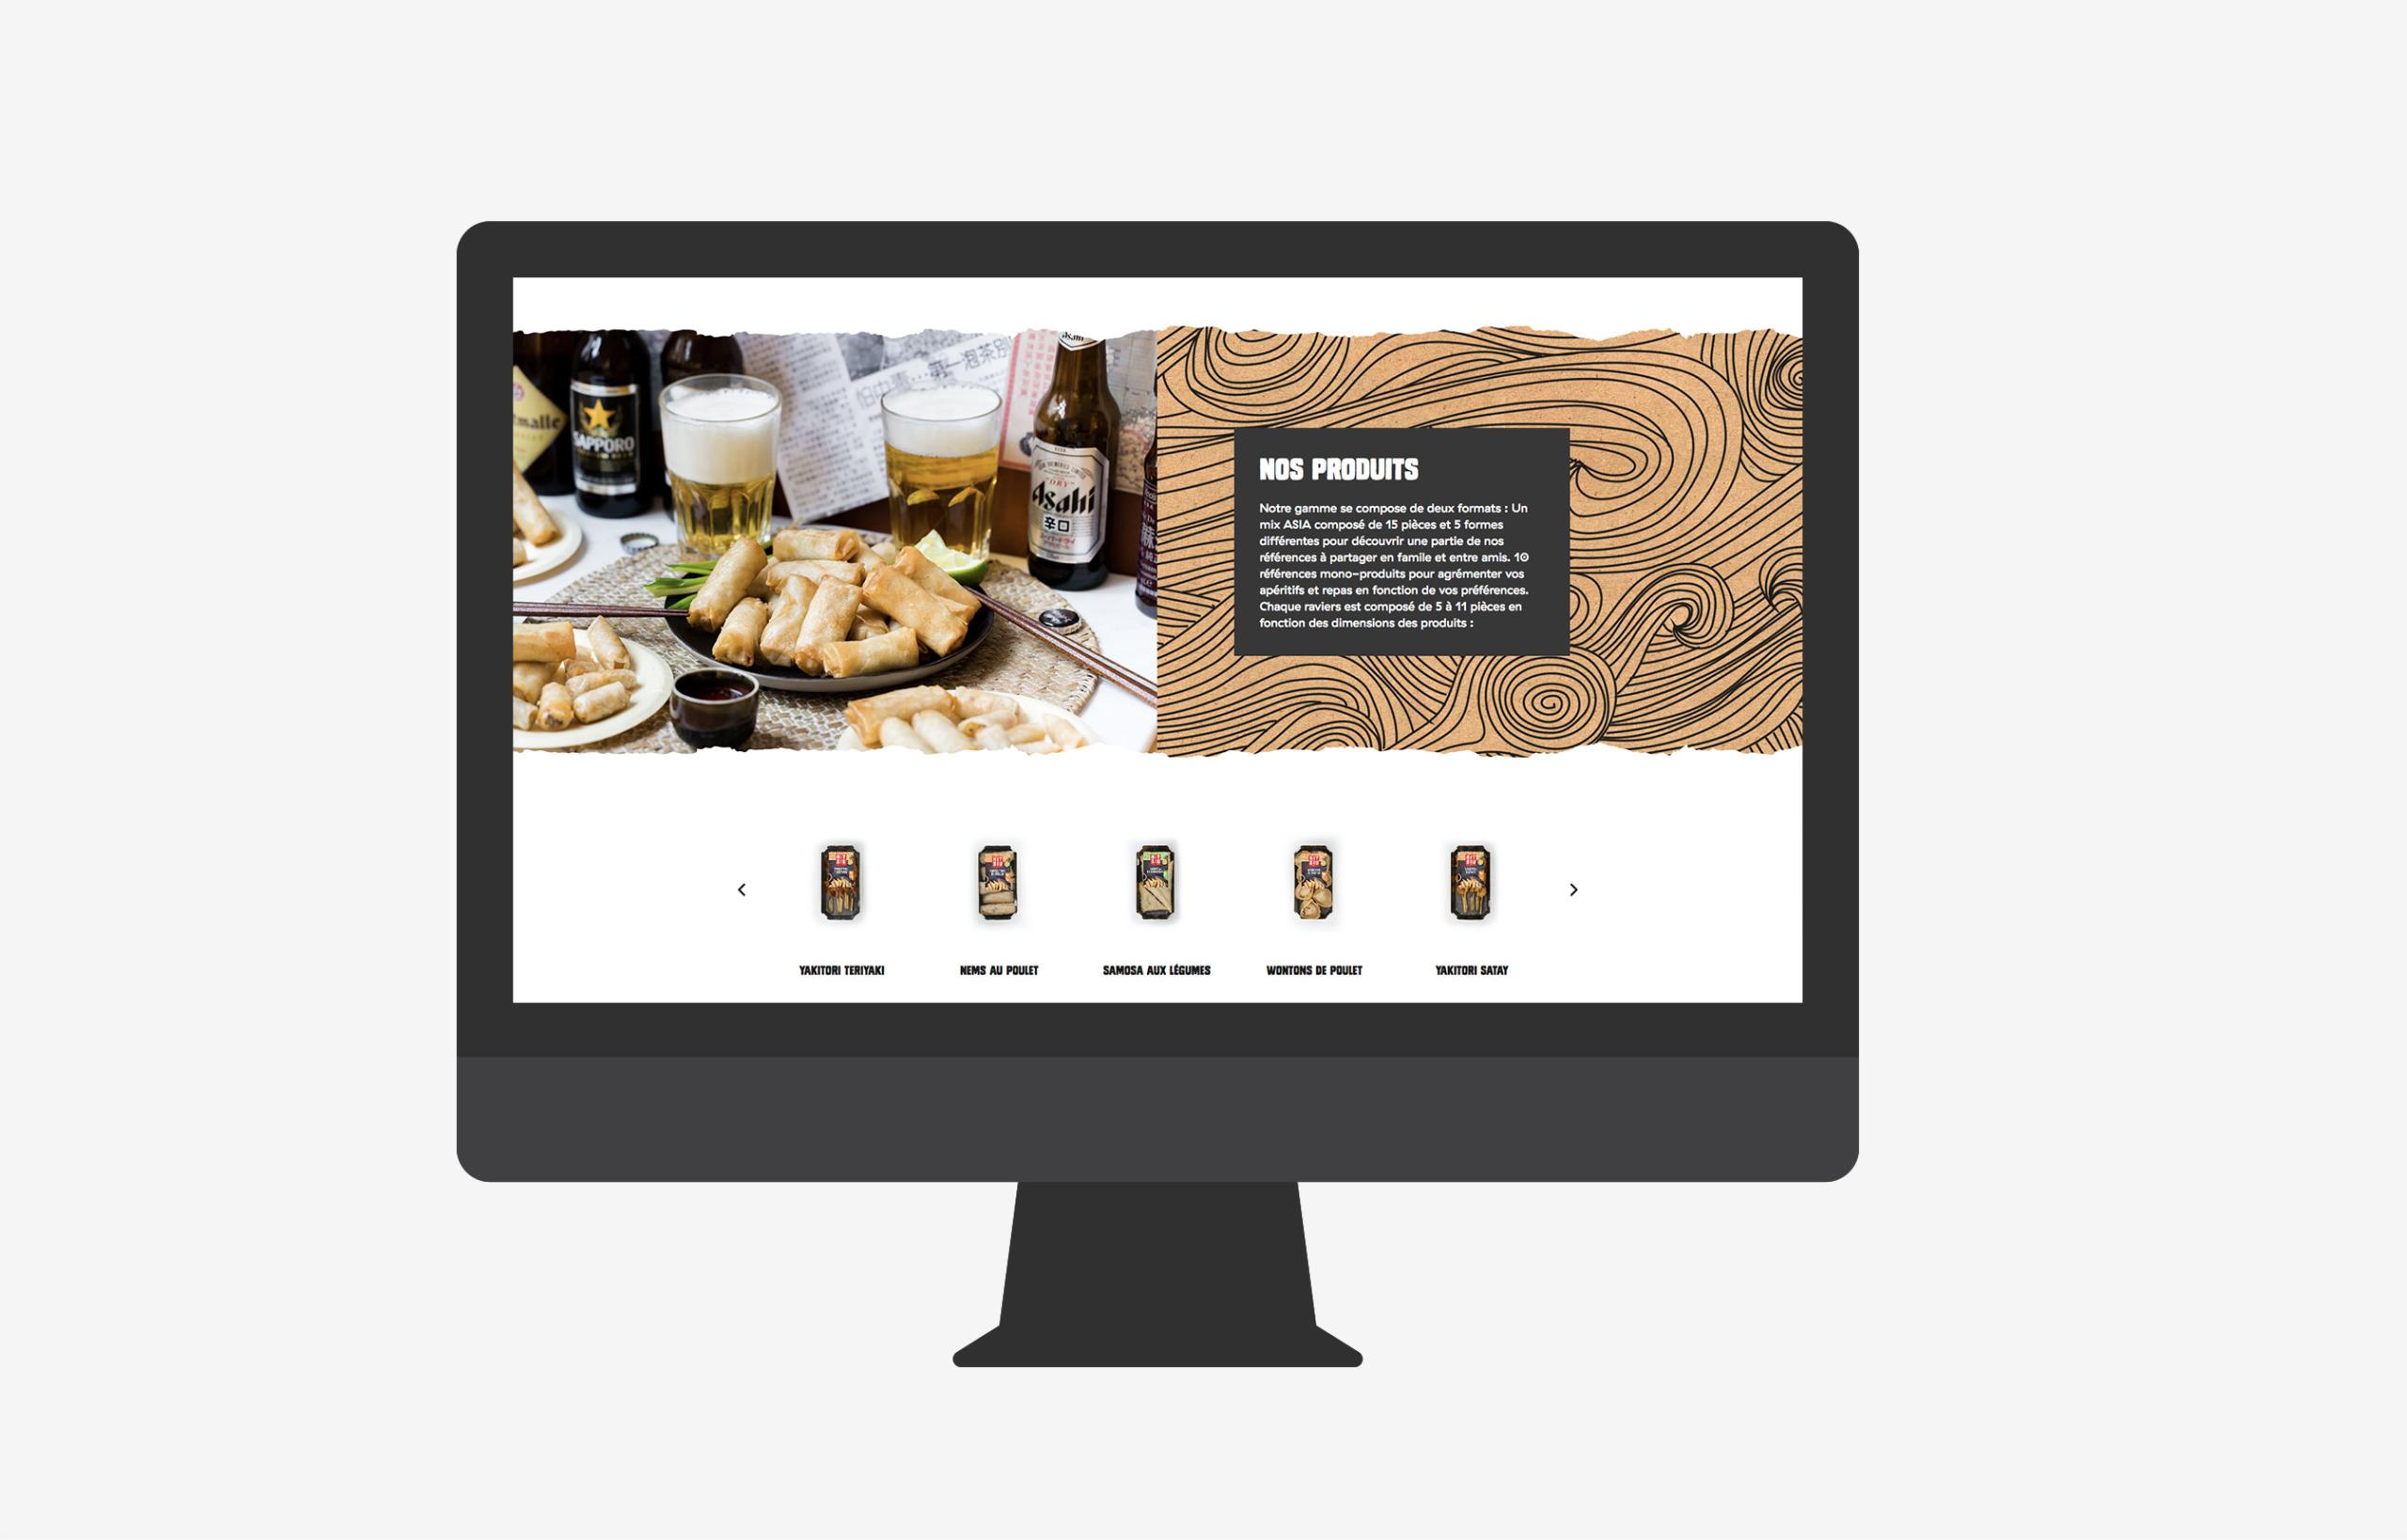 02-web-nitsiu-pikteo-webdesign-graphic-design-freelance-paris-bruxelles-londres